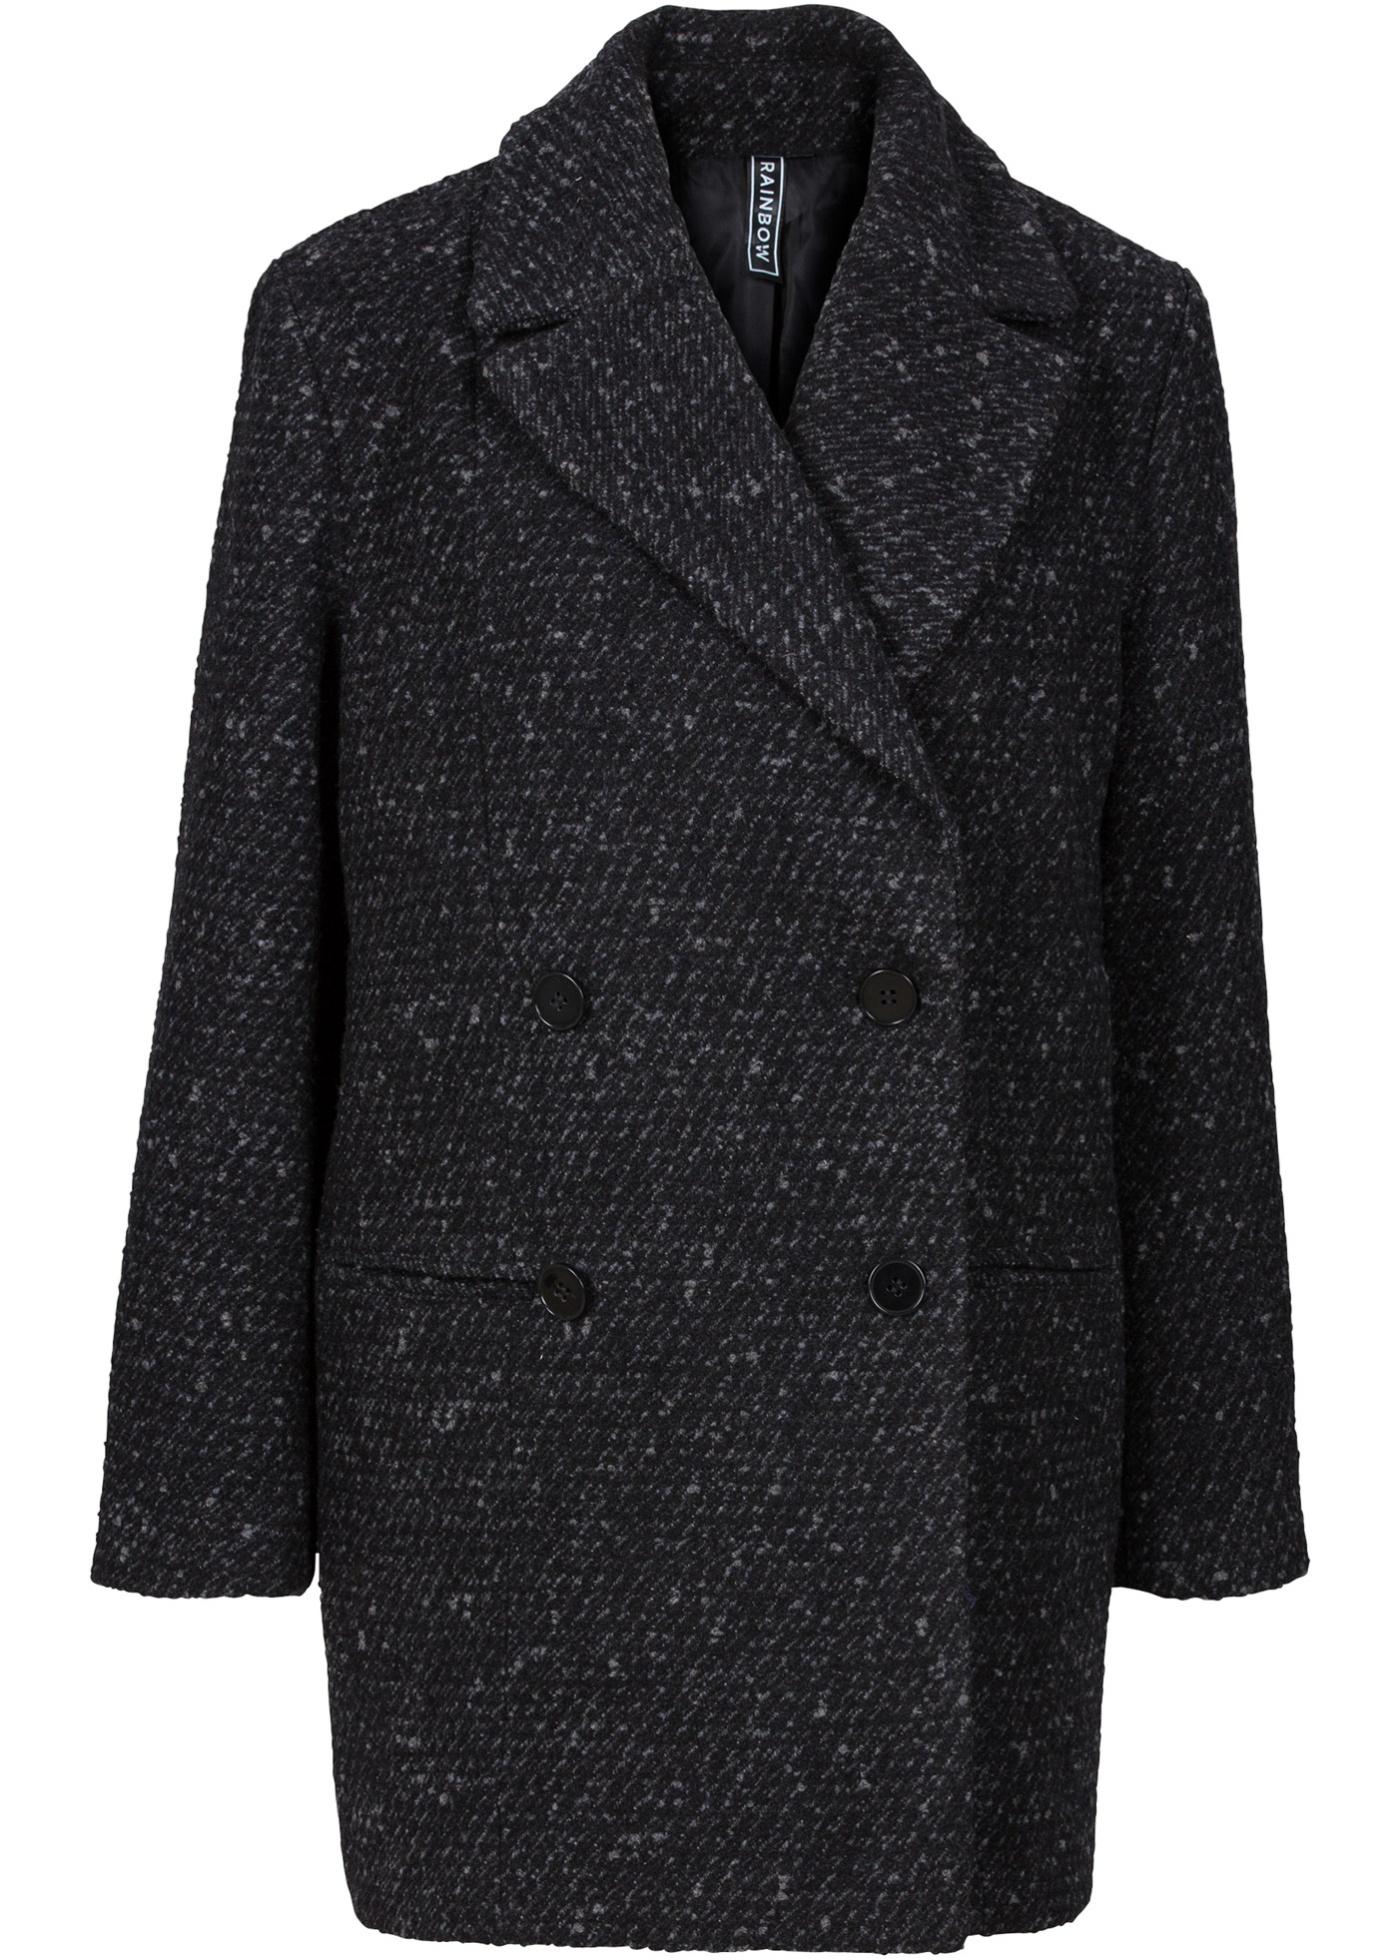 manteau long femme jusqu 75 v tements femme pureshopping. Black Bedroom Furniture Sets. Home Design Ideas